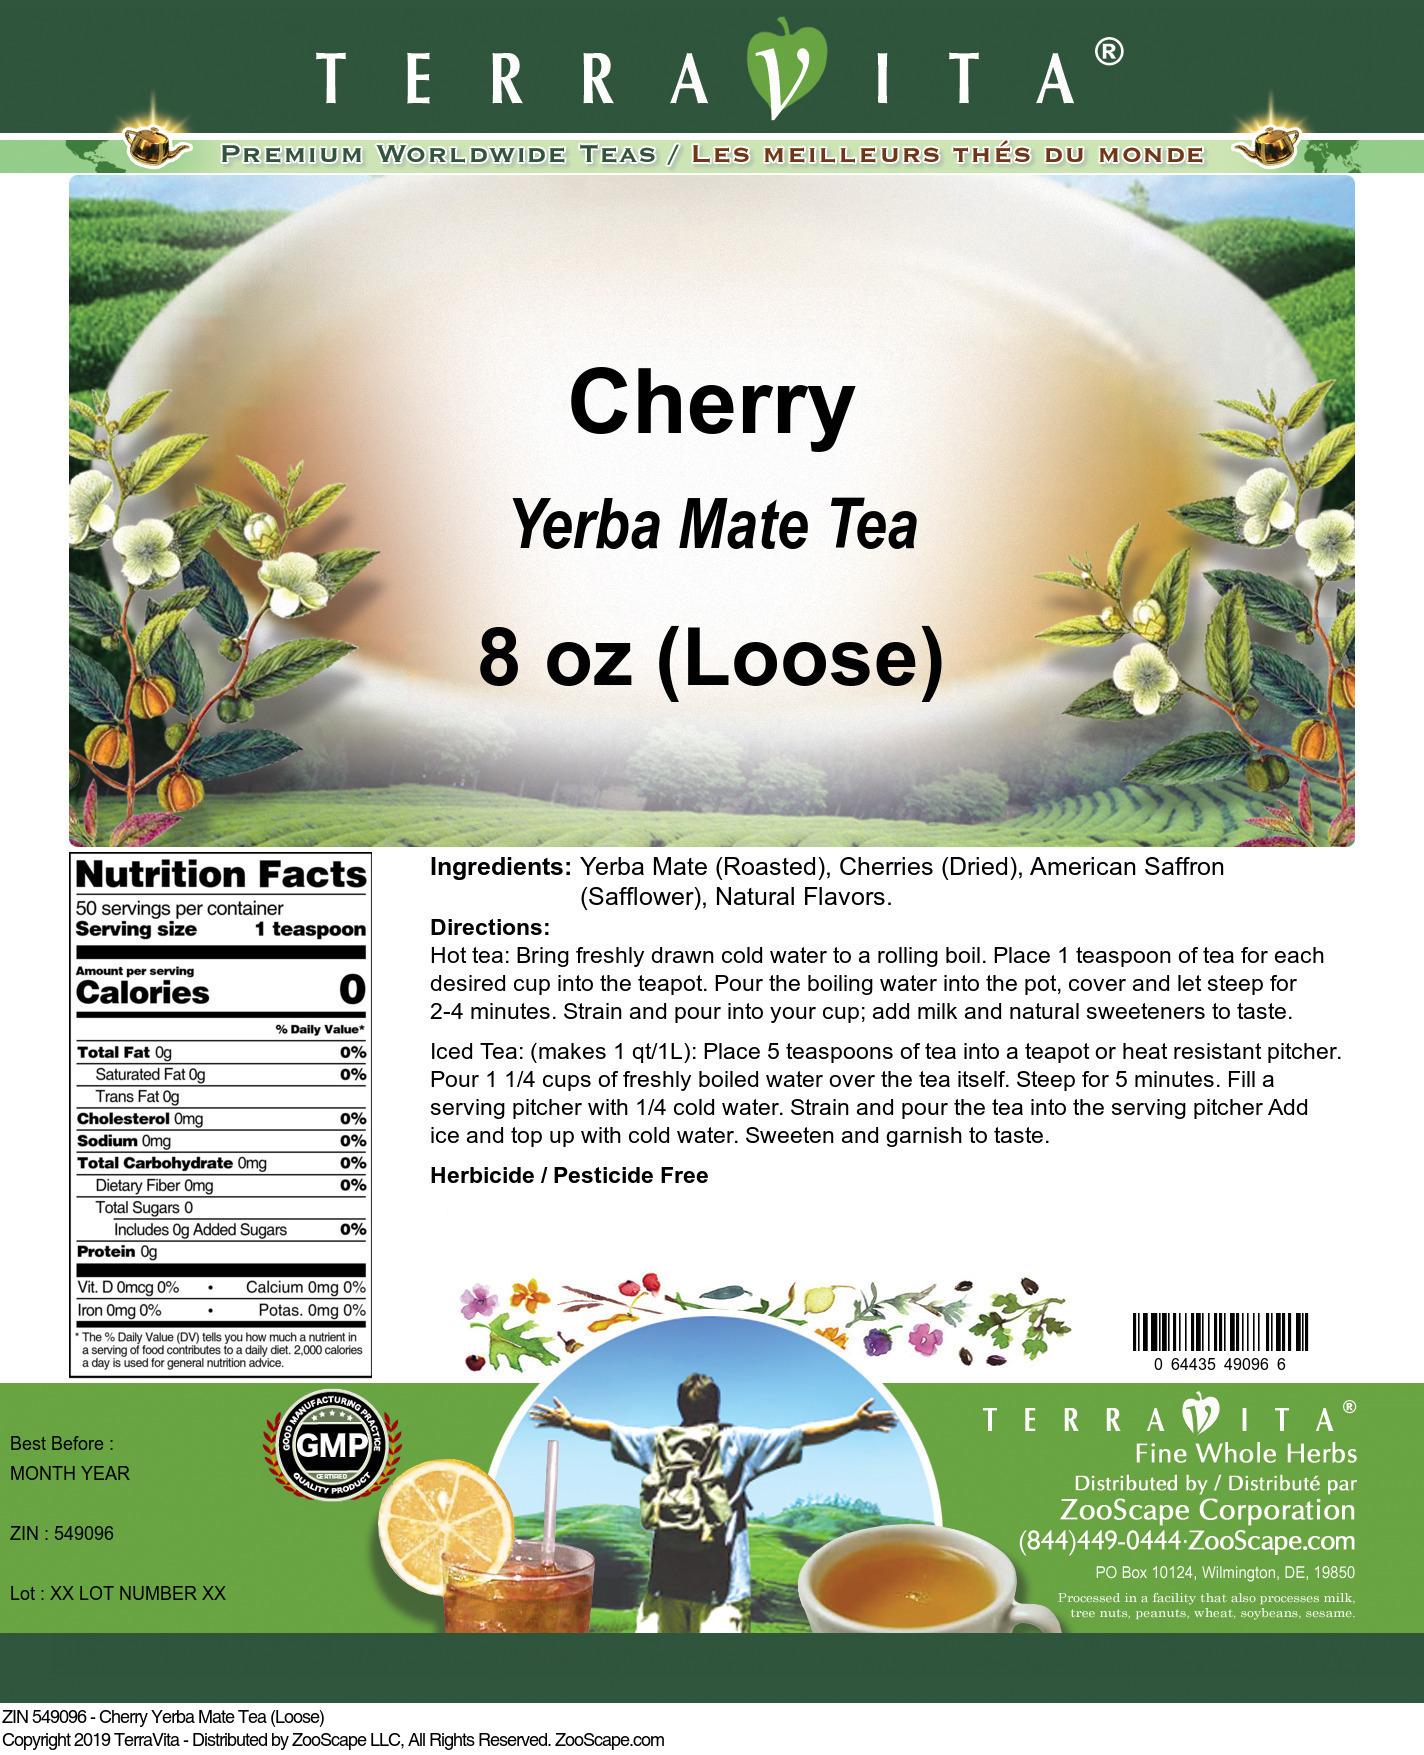 Cherry Yerba Mate Tea (Loose)